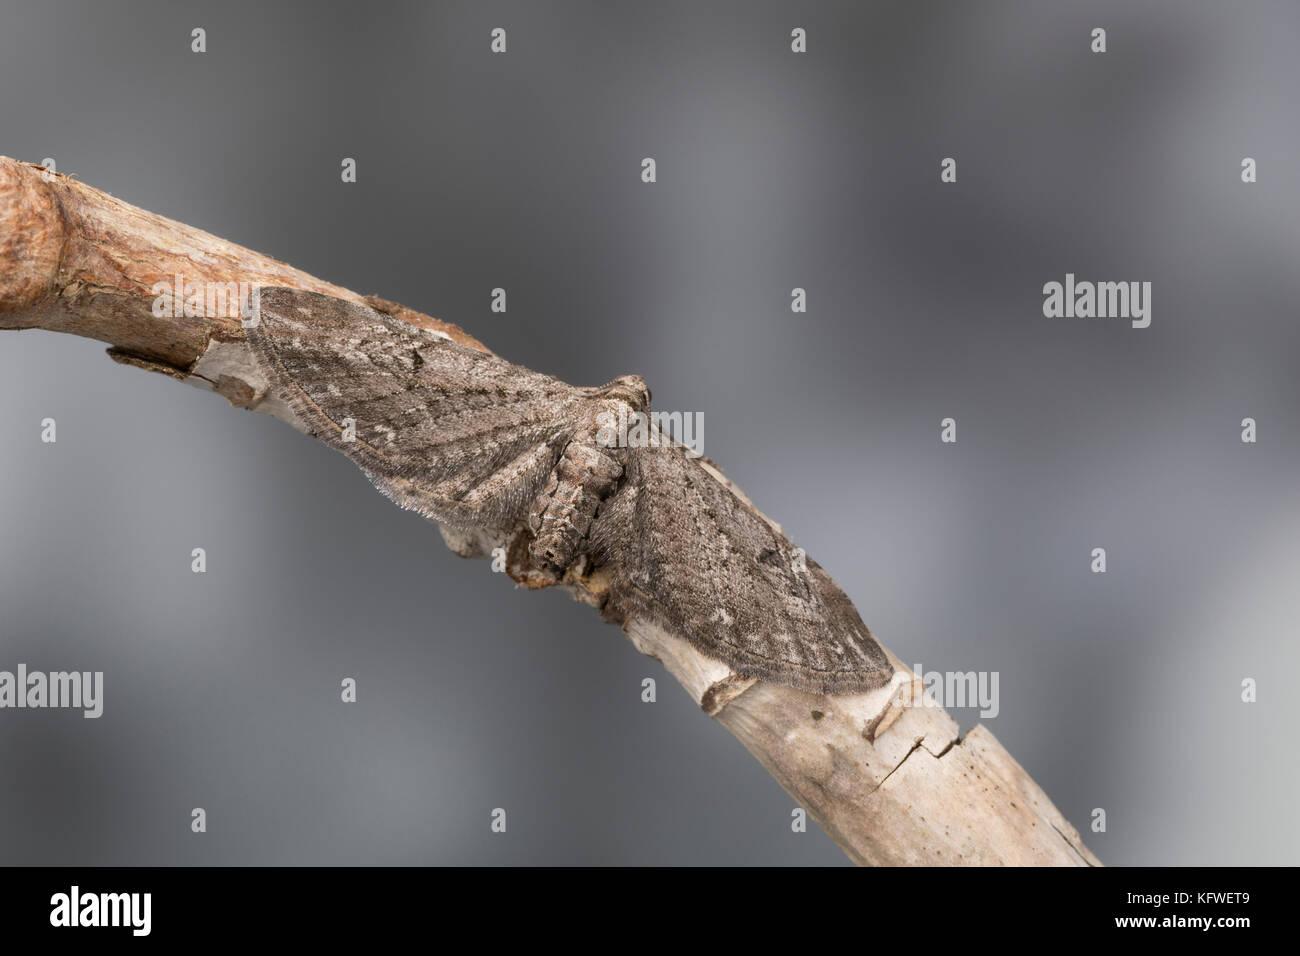 Feldbeifuß-Blütenspanner, Feldbeifuss-Blütenspanner, Blütenspanner, Eupithecia innotata, angle-barred pug, Spanner, Stock Photo